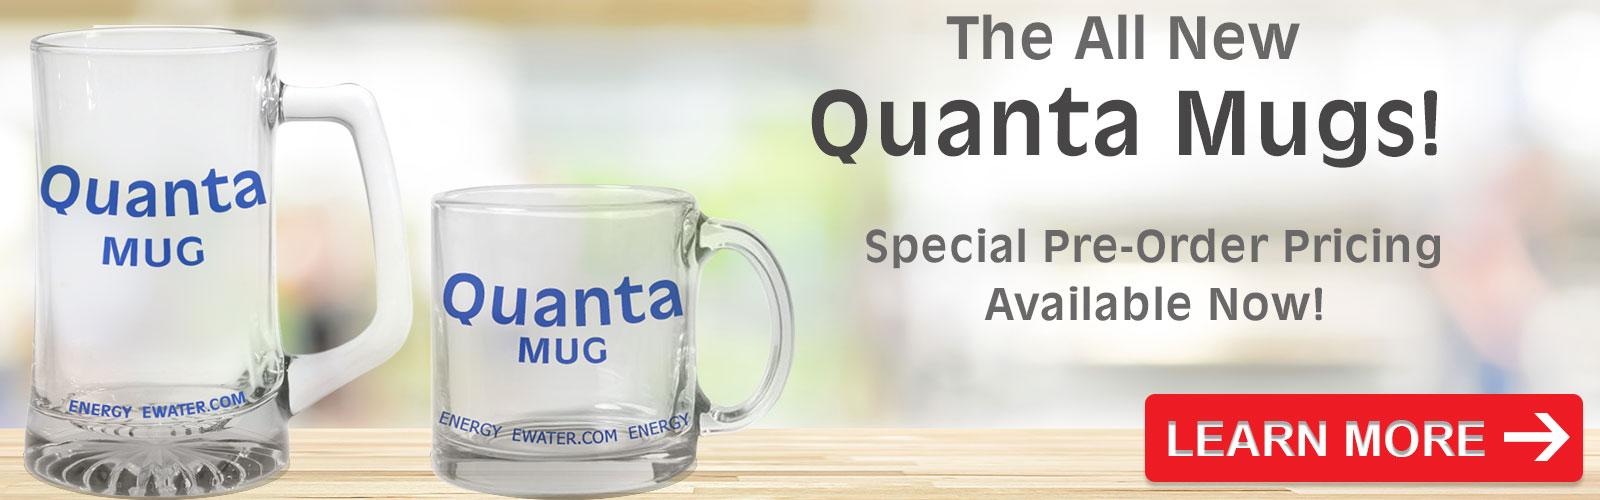 quanta-mug-banner1.jpg